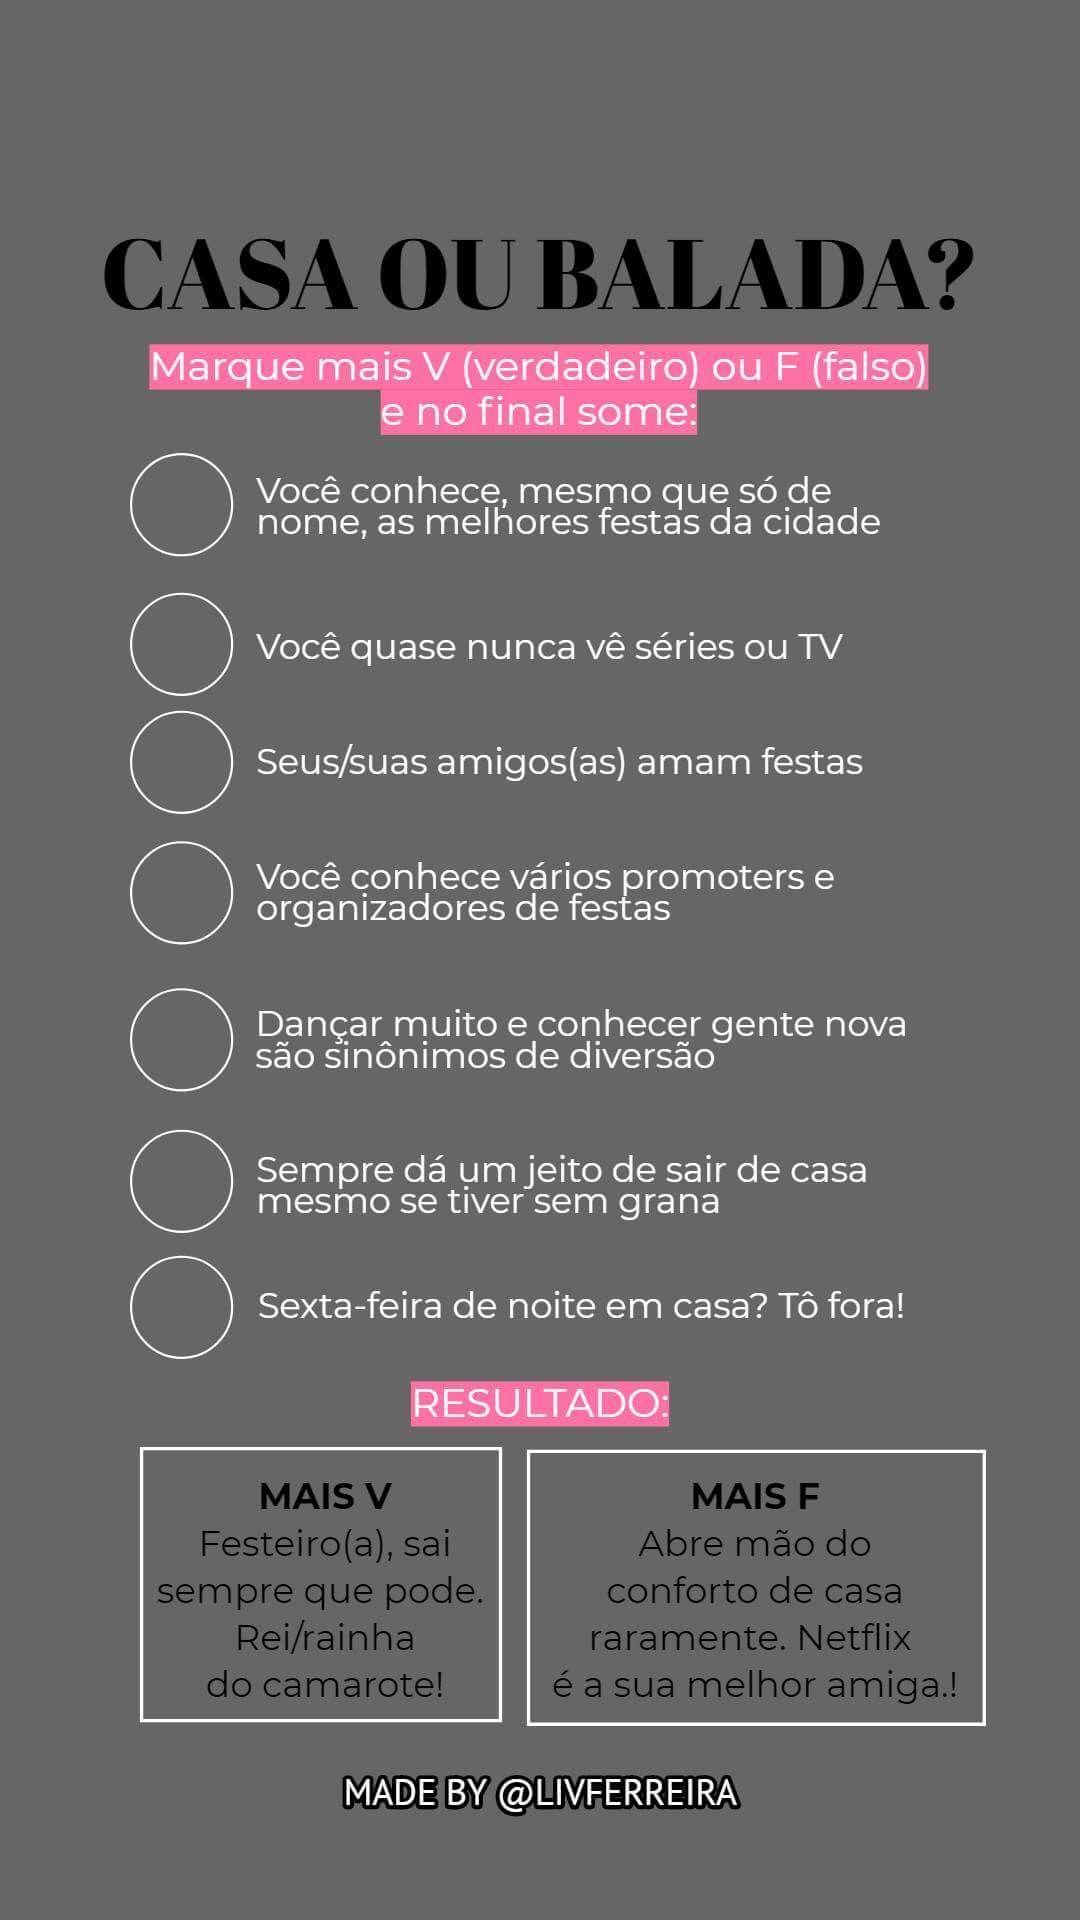 Template Instagram Casa Ou Balada Teste Status Frases Desafíos